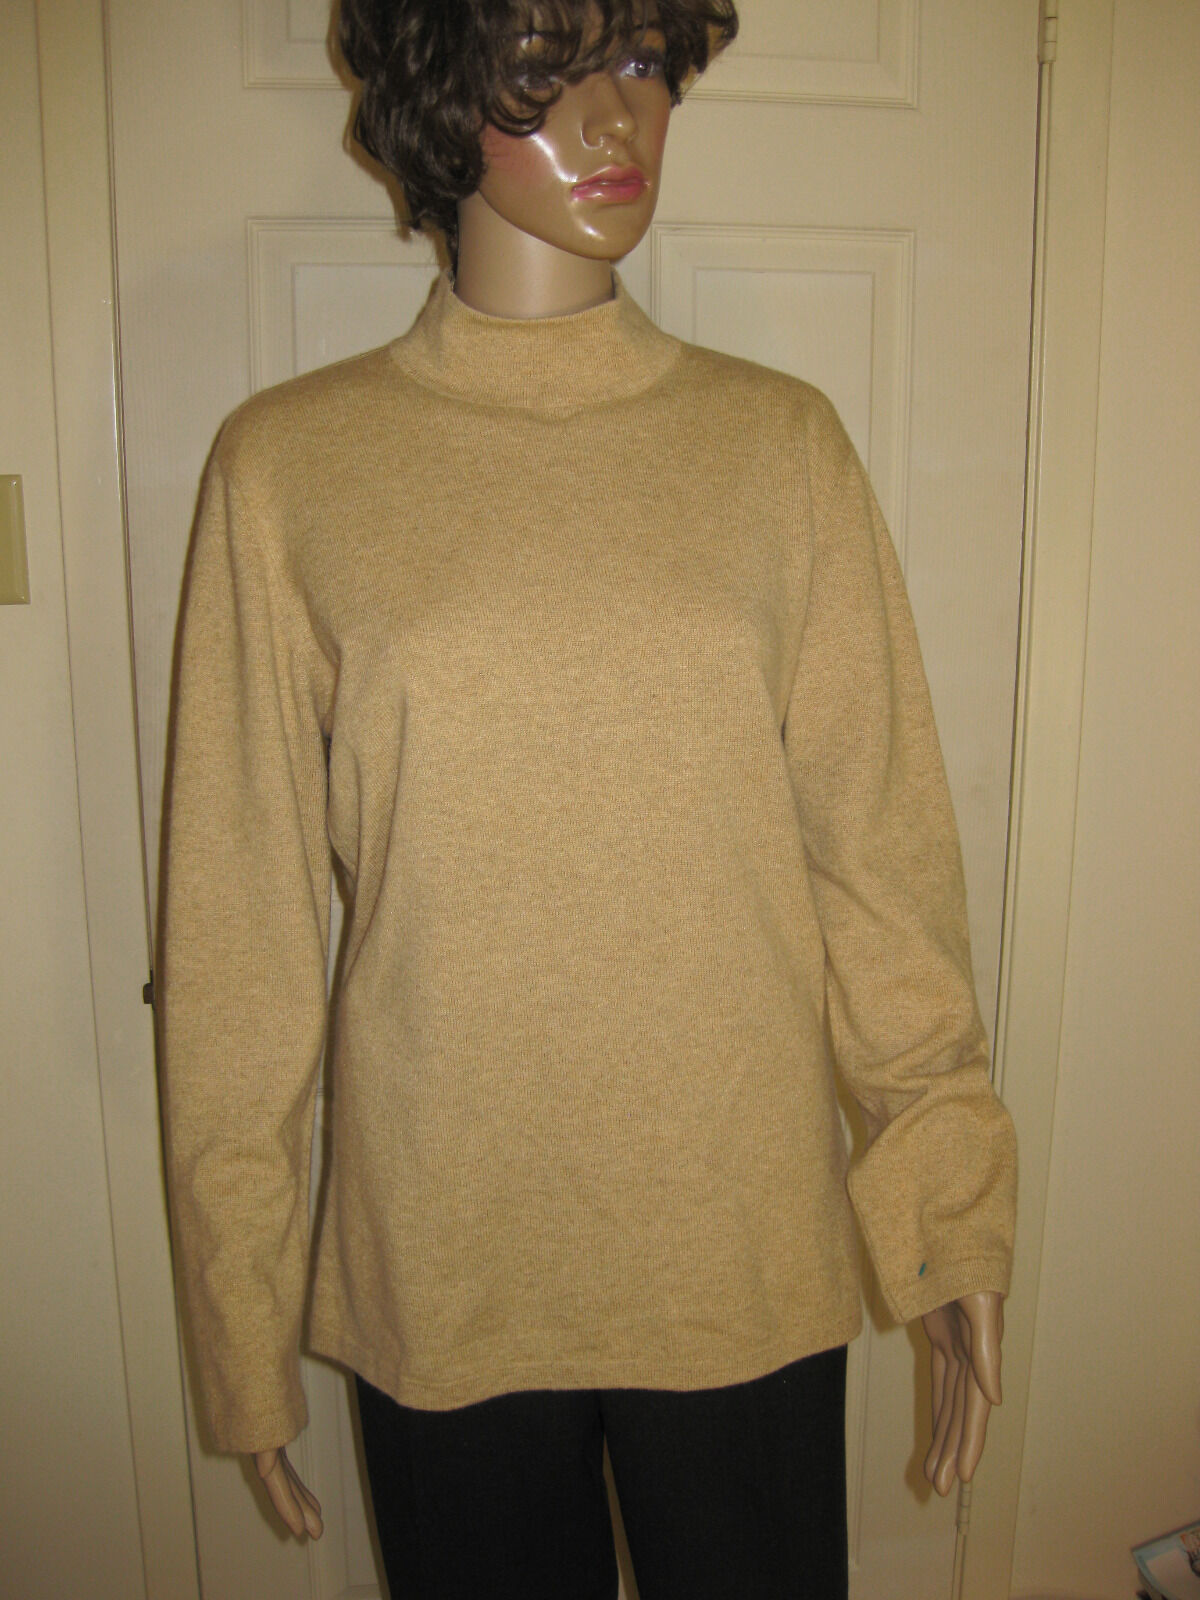 Escada Sz 44 (14) Camel Heather New Wolle Cashmere Silk Blend LS Mock Turtle Neck